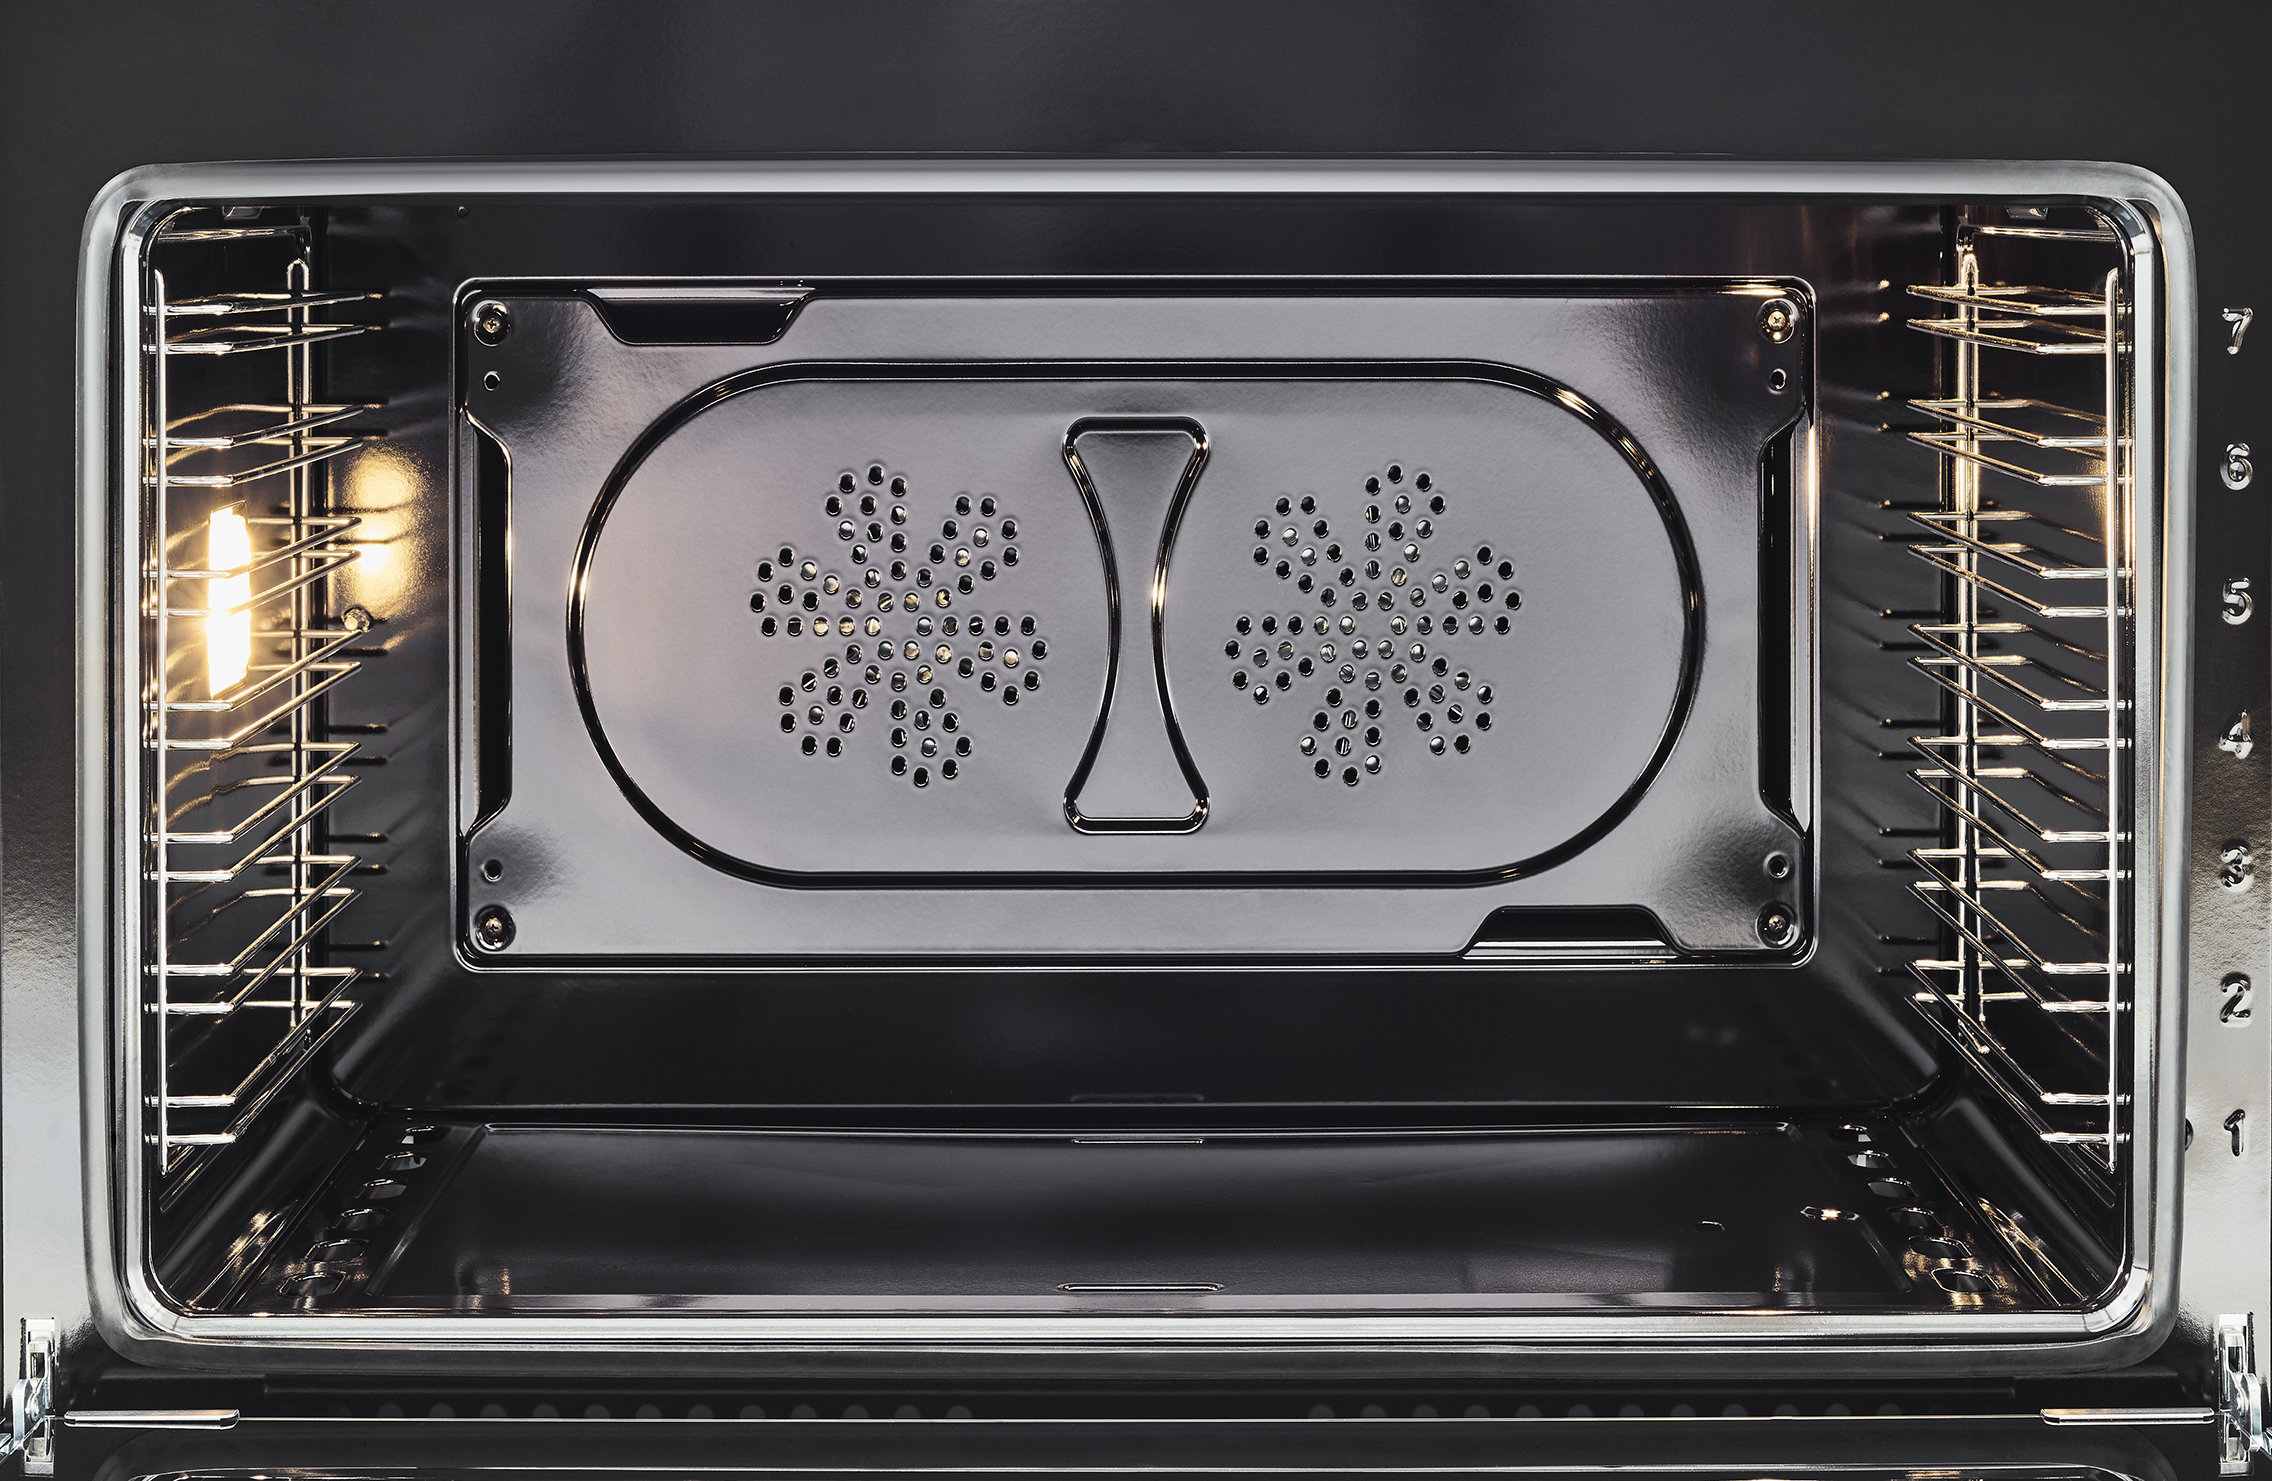 "Model: MAST305GASXE | Bertazzoni 30"" Master Series range - Gas oven - 5 aluminum burners"